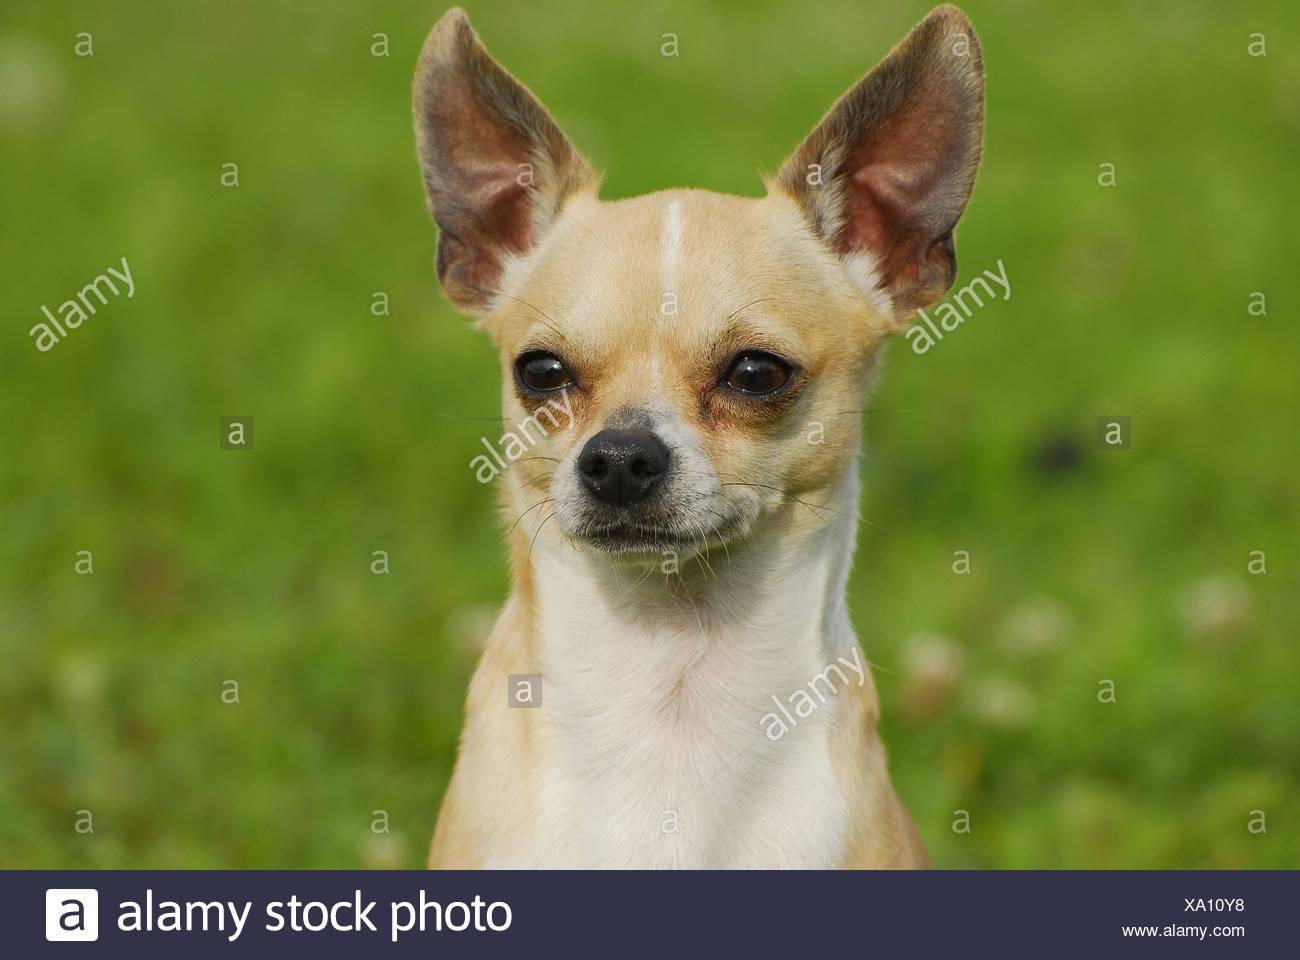 Chihuahua Portrait - Stock Image